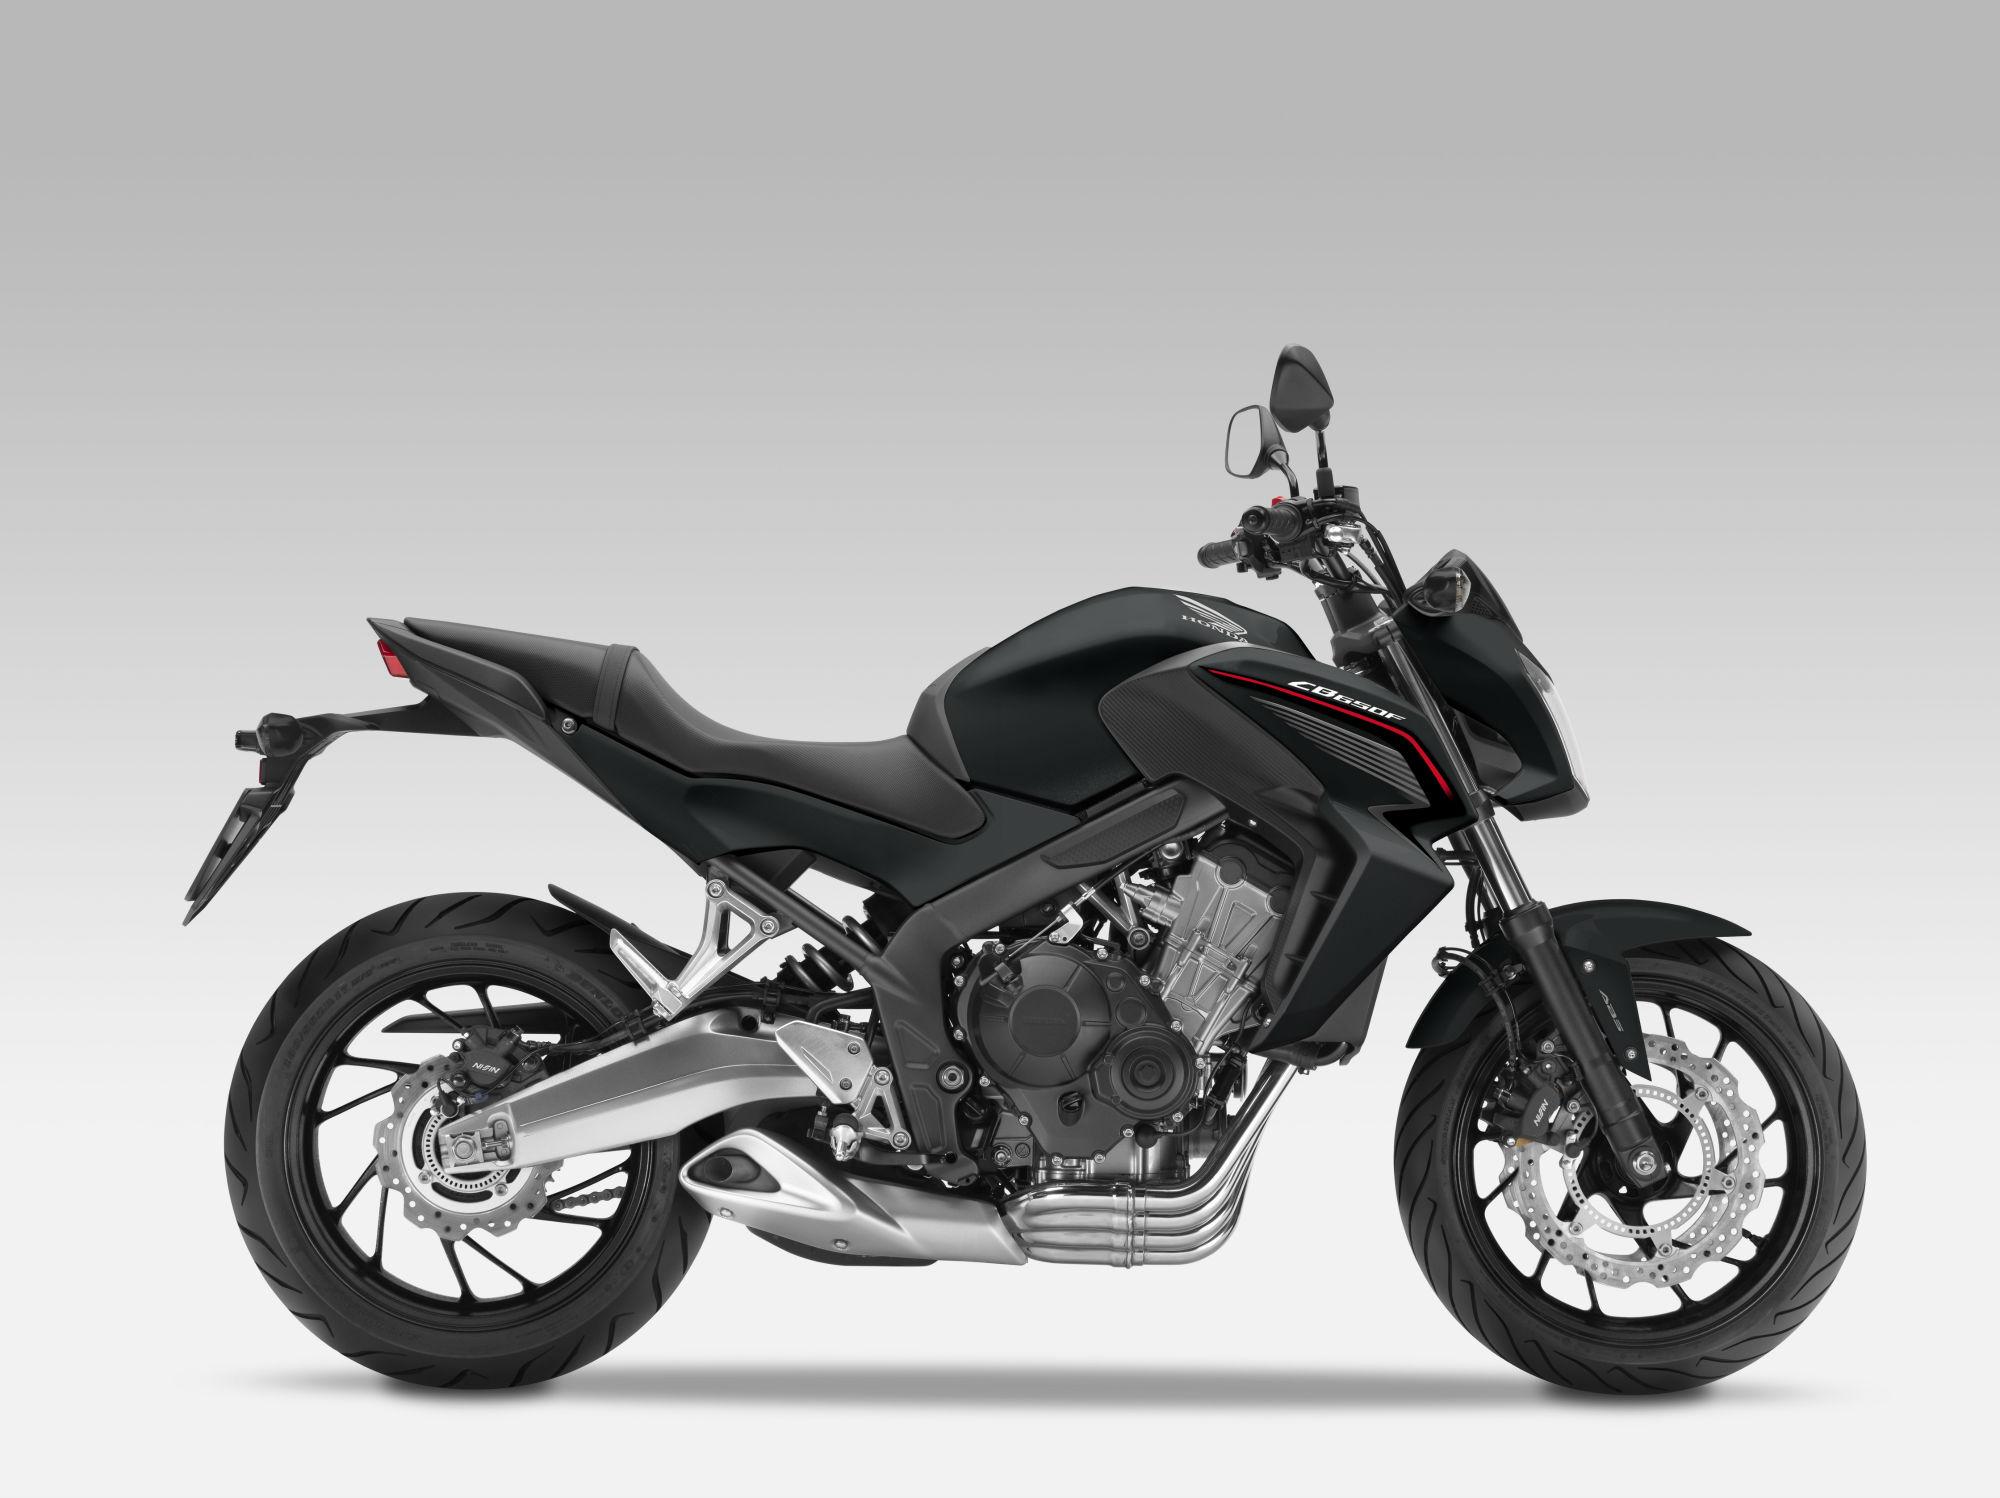 Honda cbr650f review uk dating 4